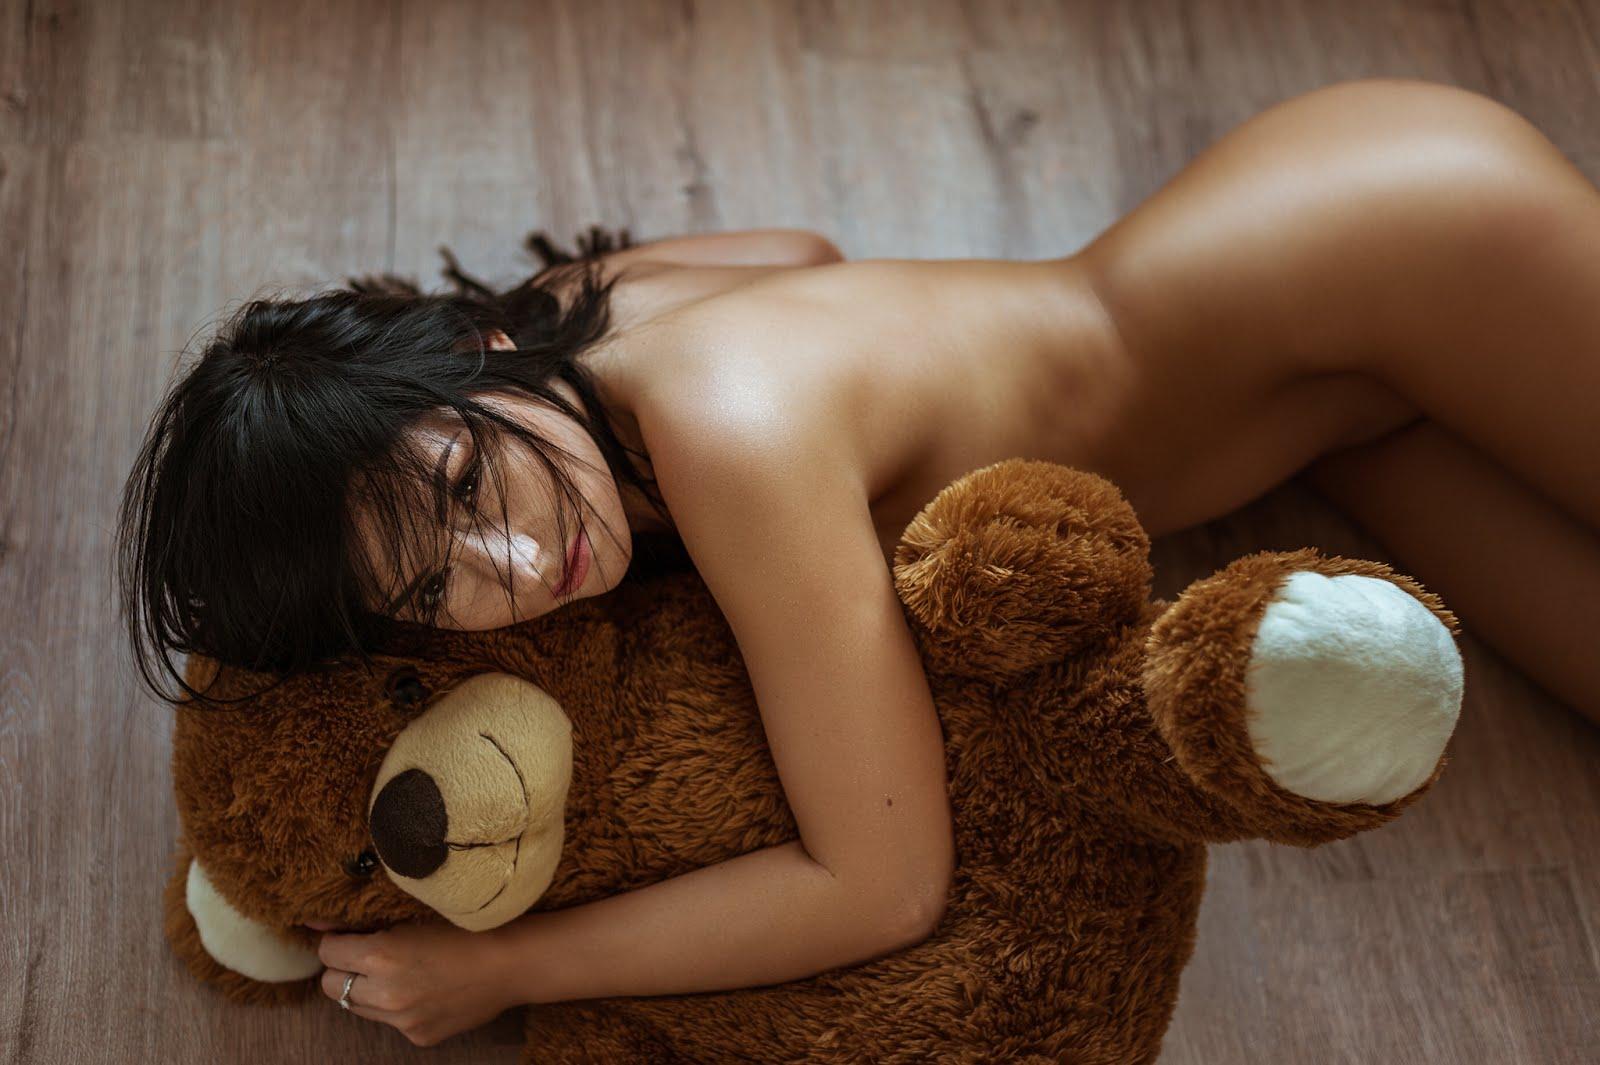 hot-n-sexy-pose-with-teddy-bear-flexible-women-gif